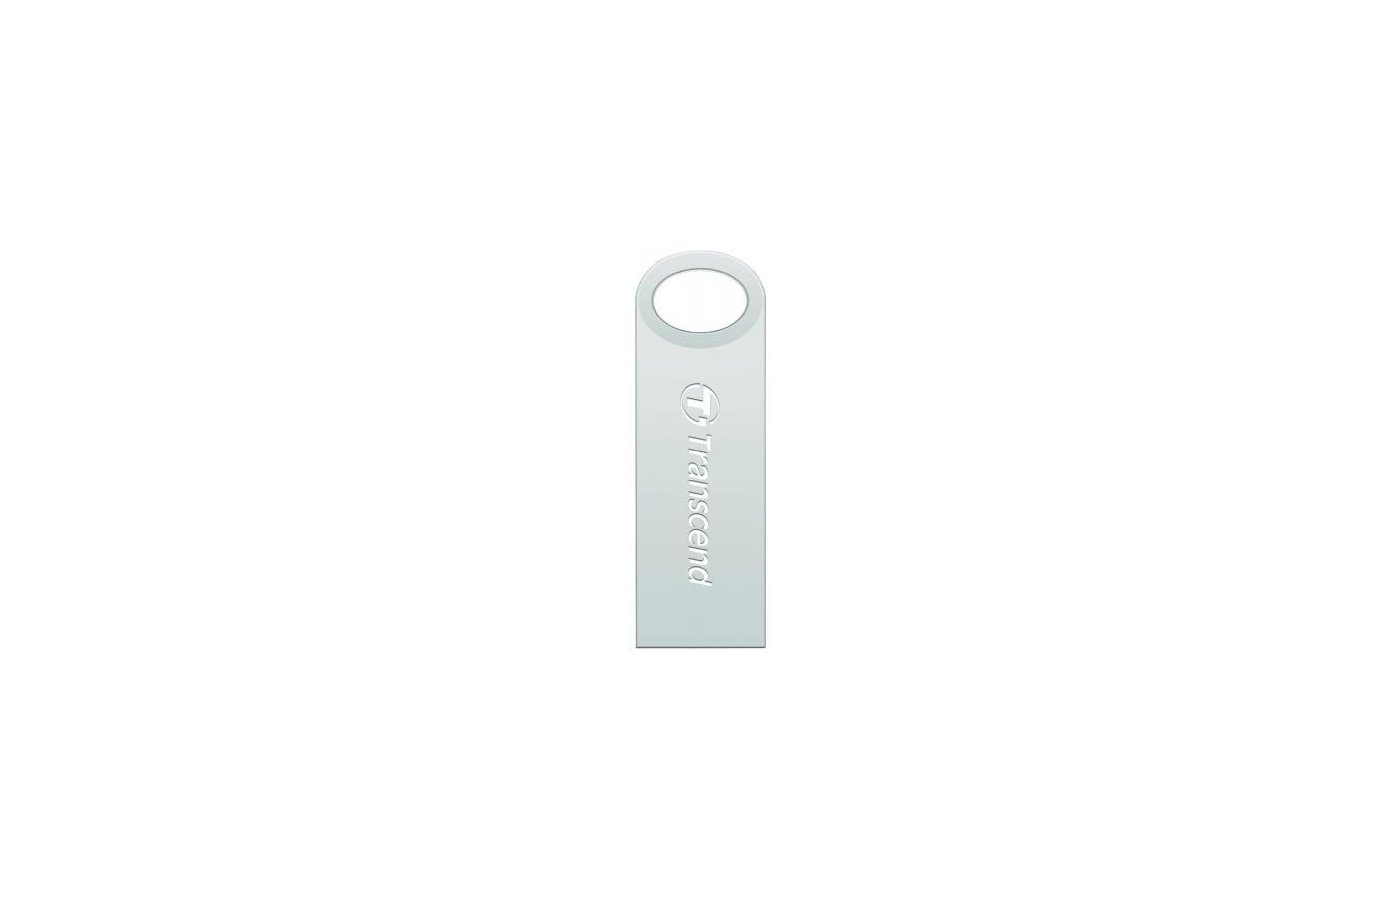 Флеш-диск USB 2.0 Transcend JetFlash 32GB 520 (TS32GJF520S)